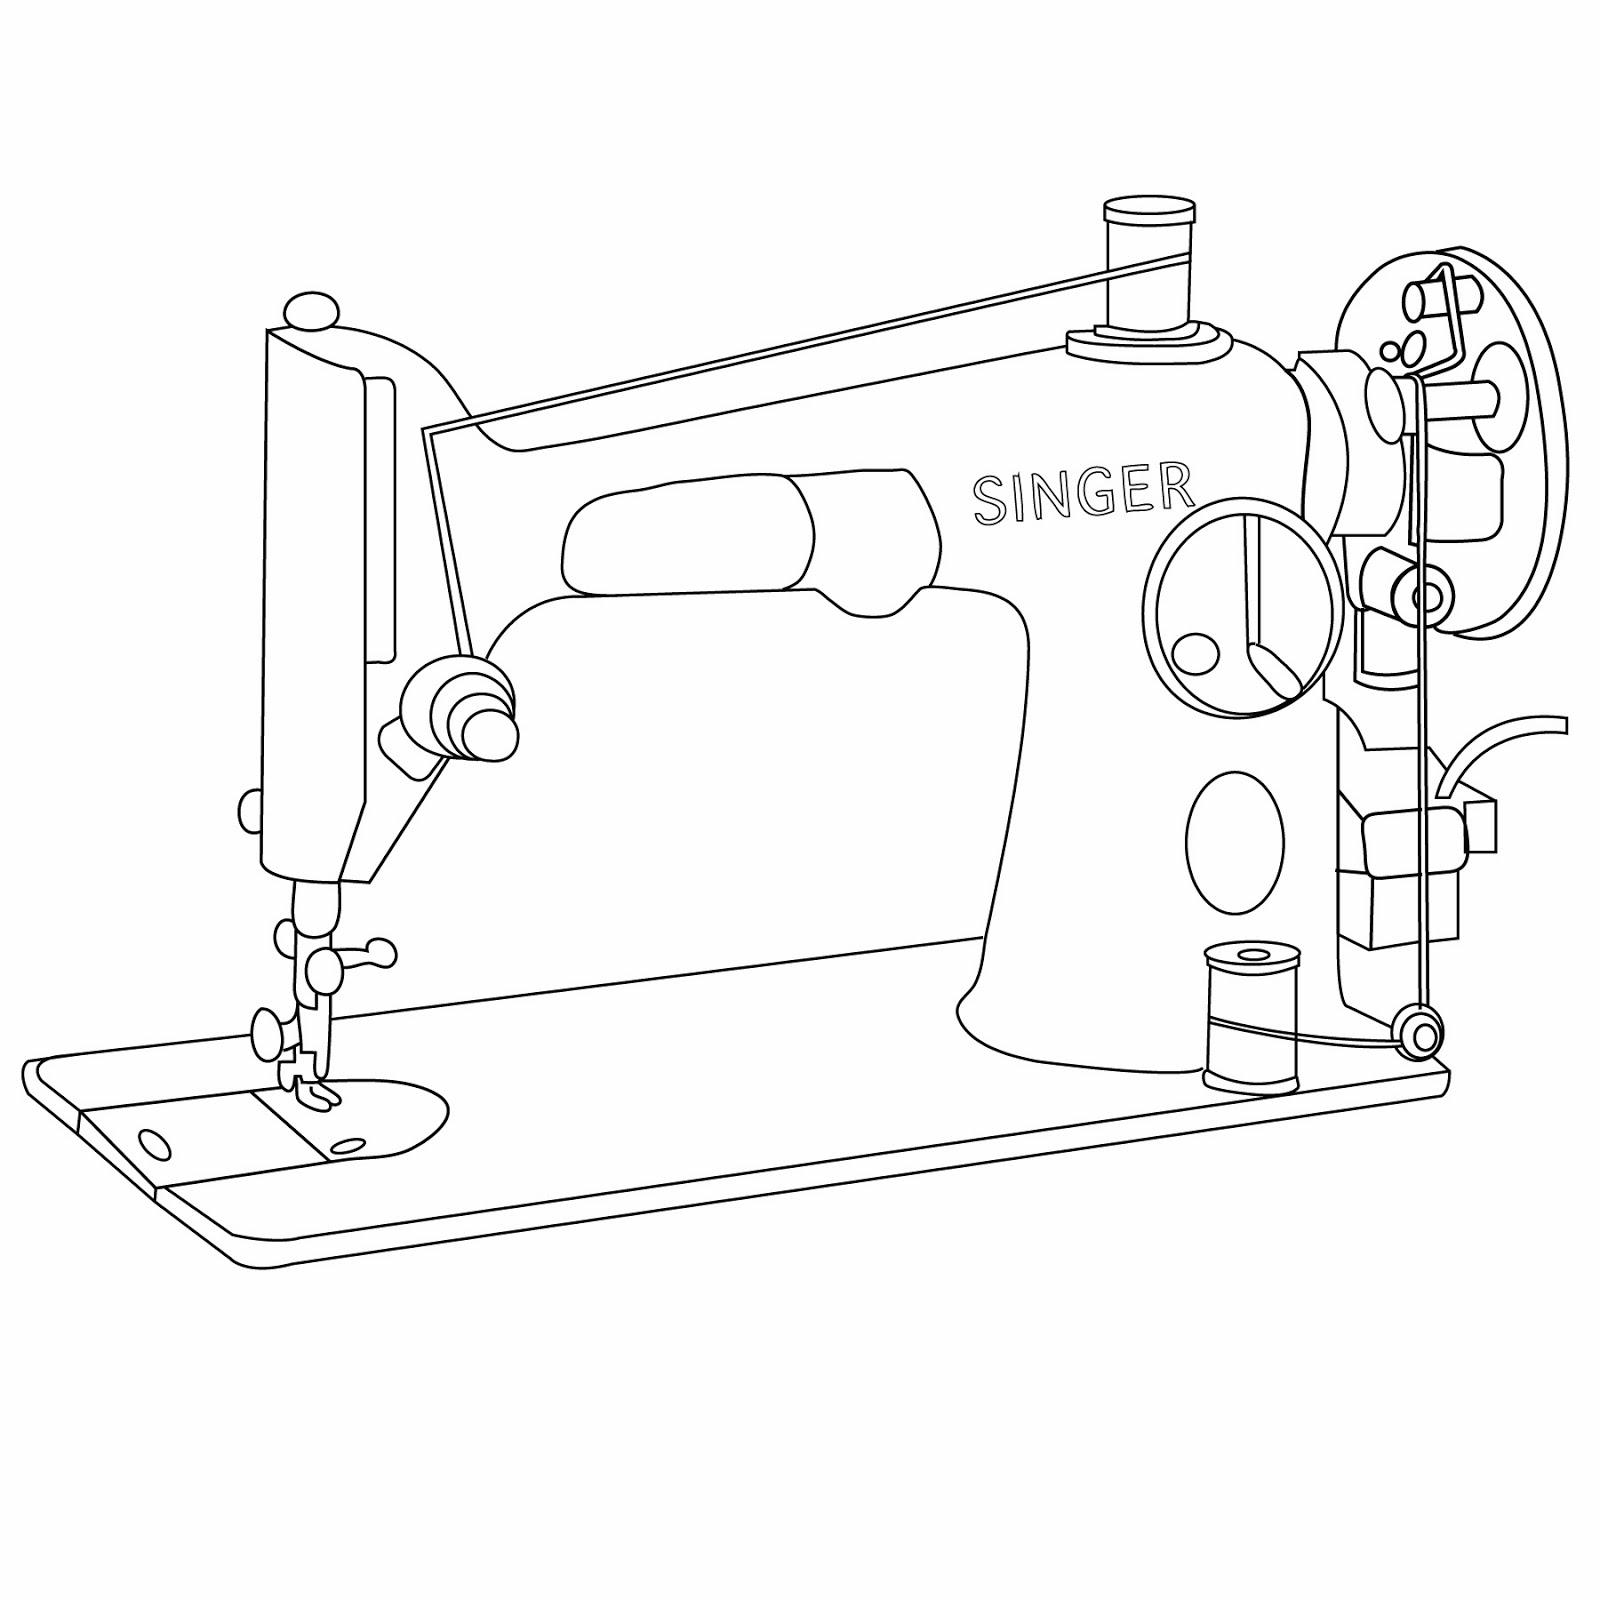 Rhoda Design Studio Singer Sewing Machine Free Graphic